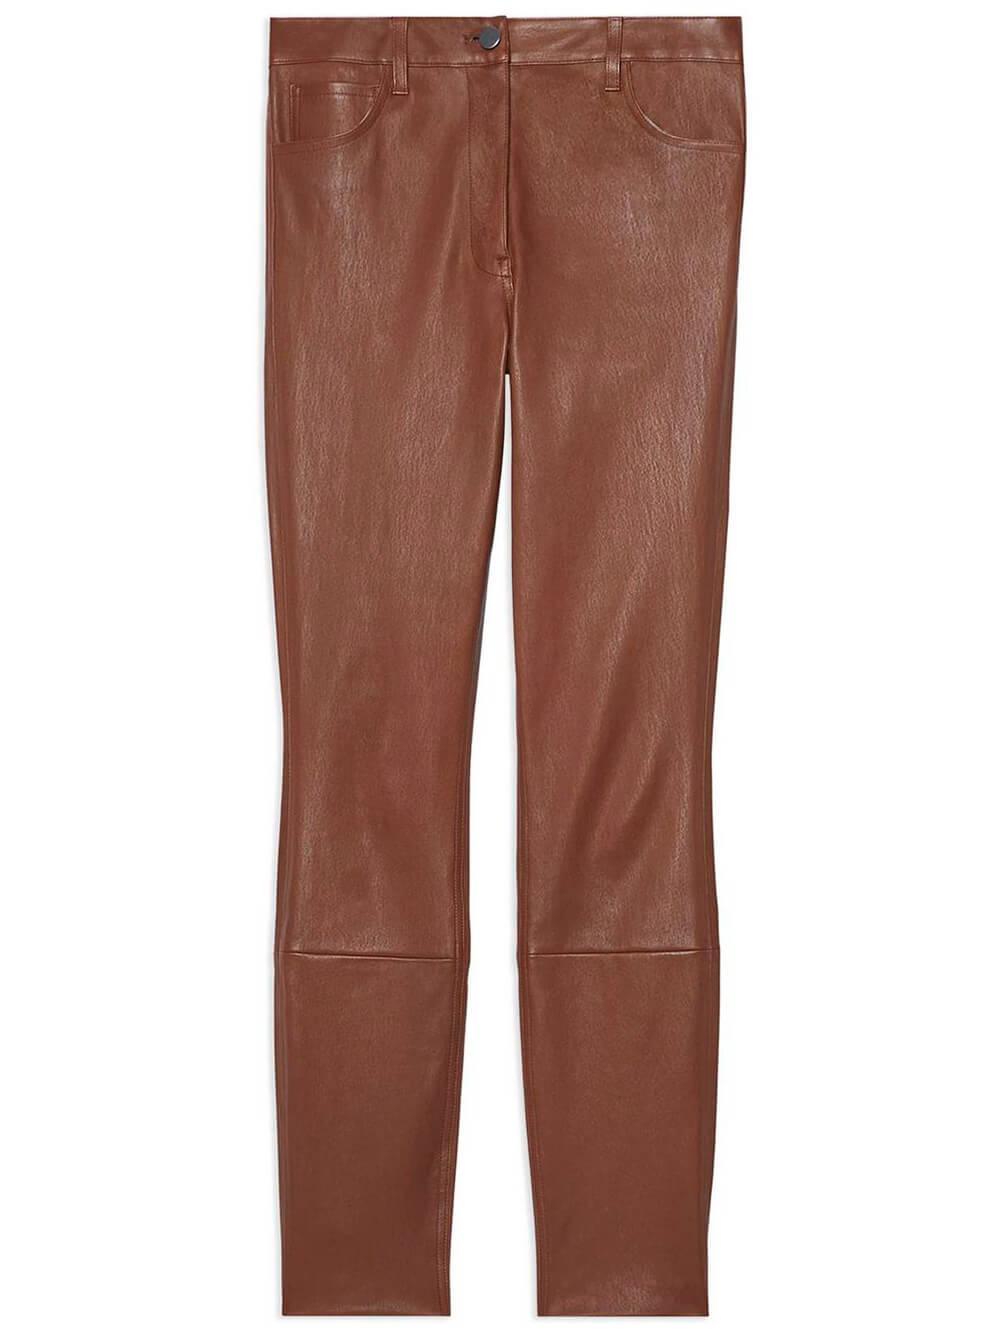 Bristol Leather Jean